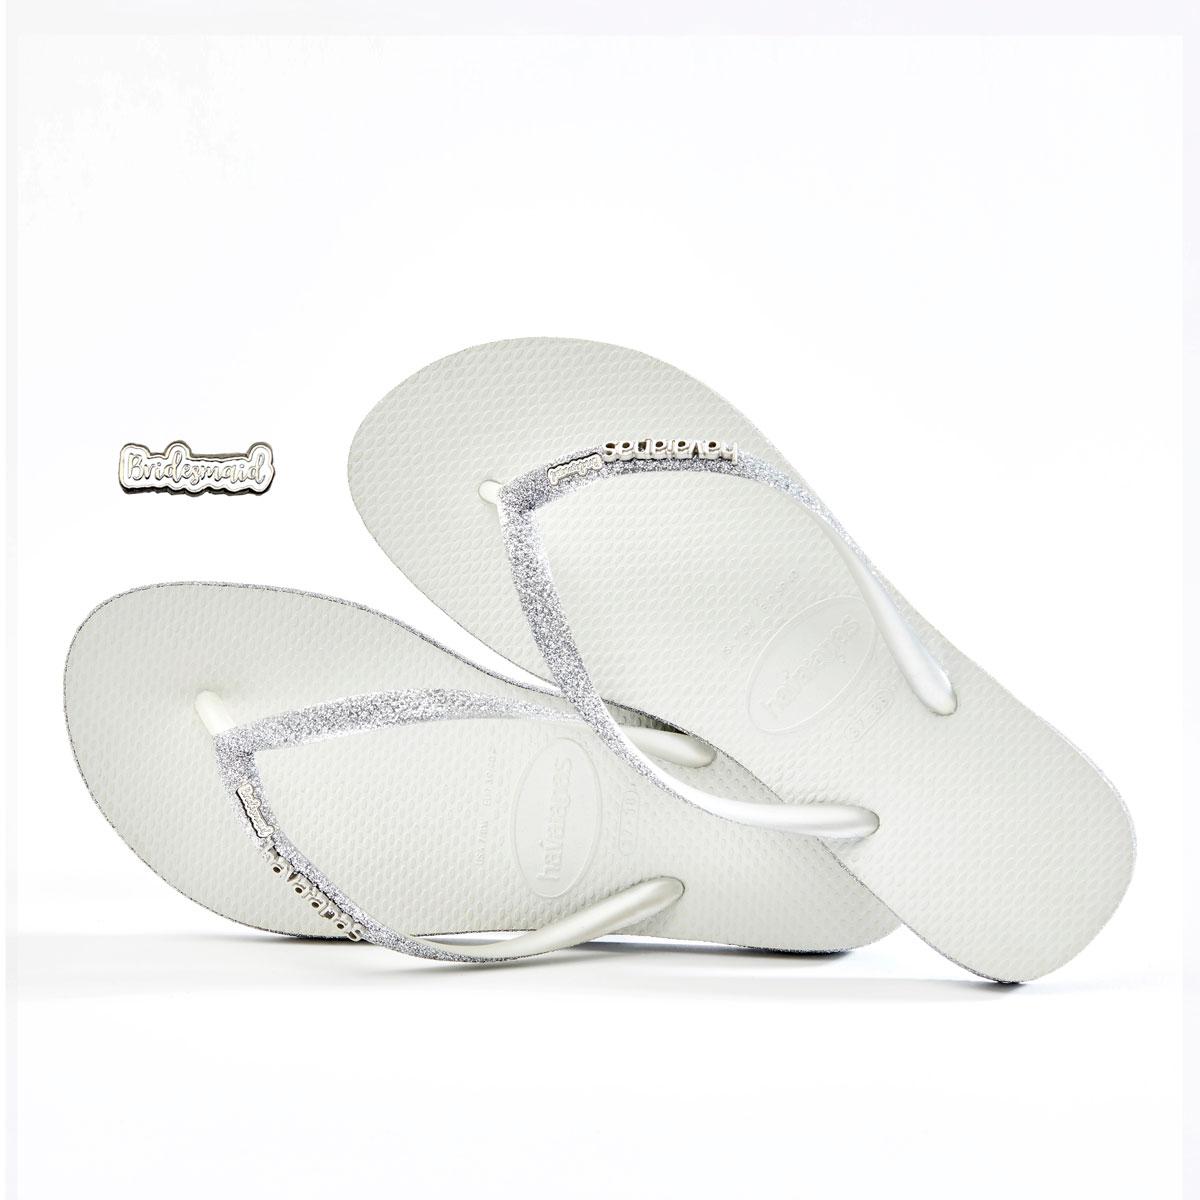 havaianas slim silver white glitter silver white bridesmaid charm